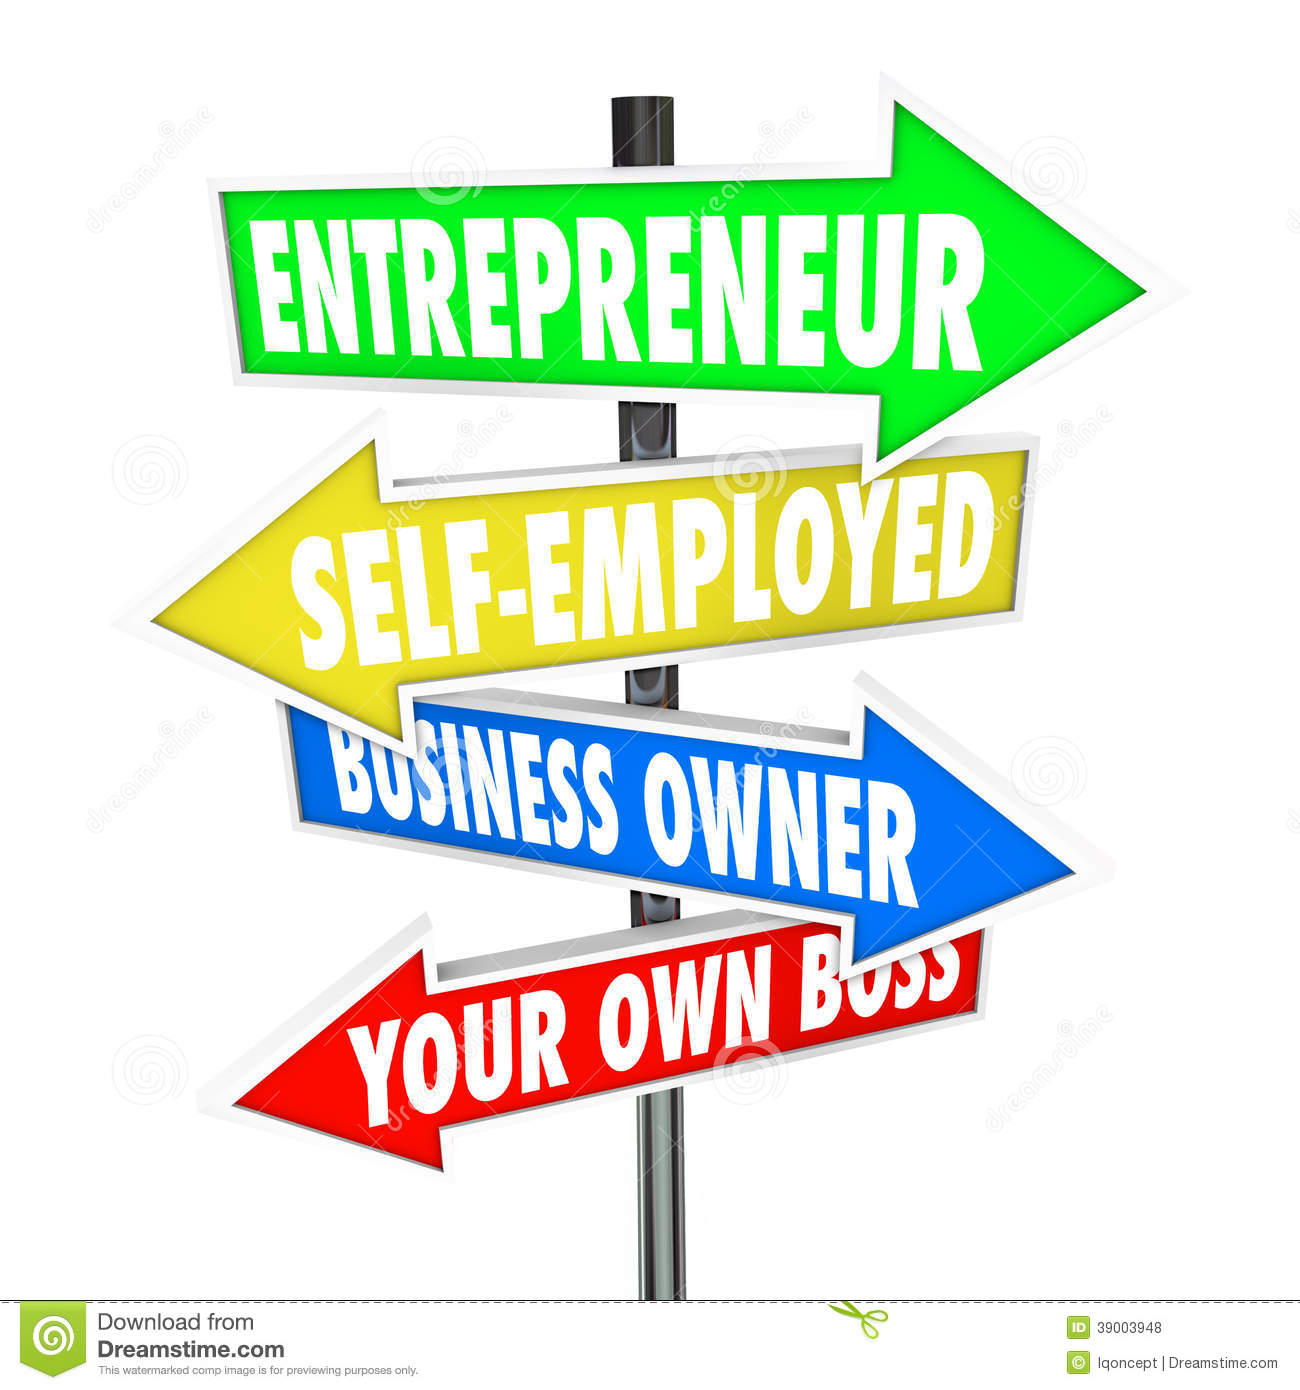 Entrepreneurship business plan powerpoint or word